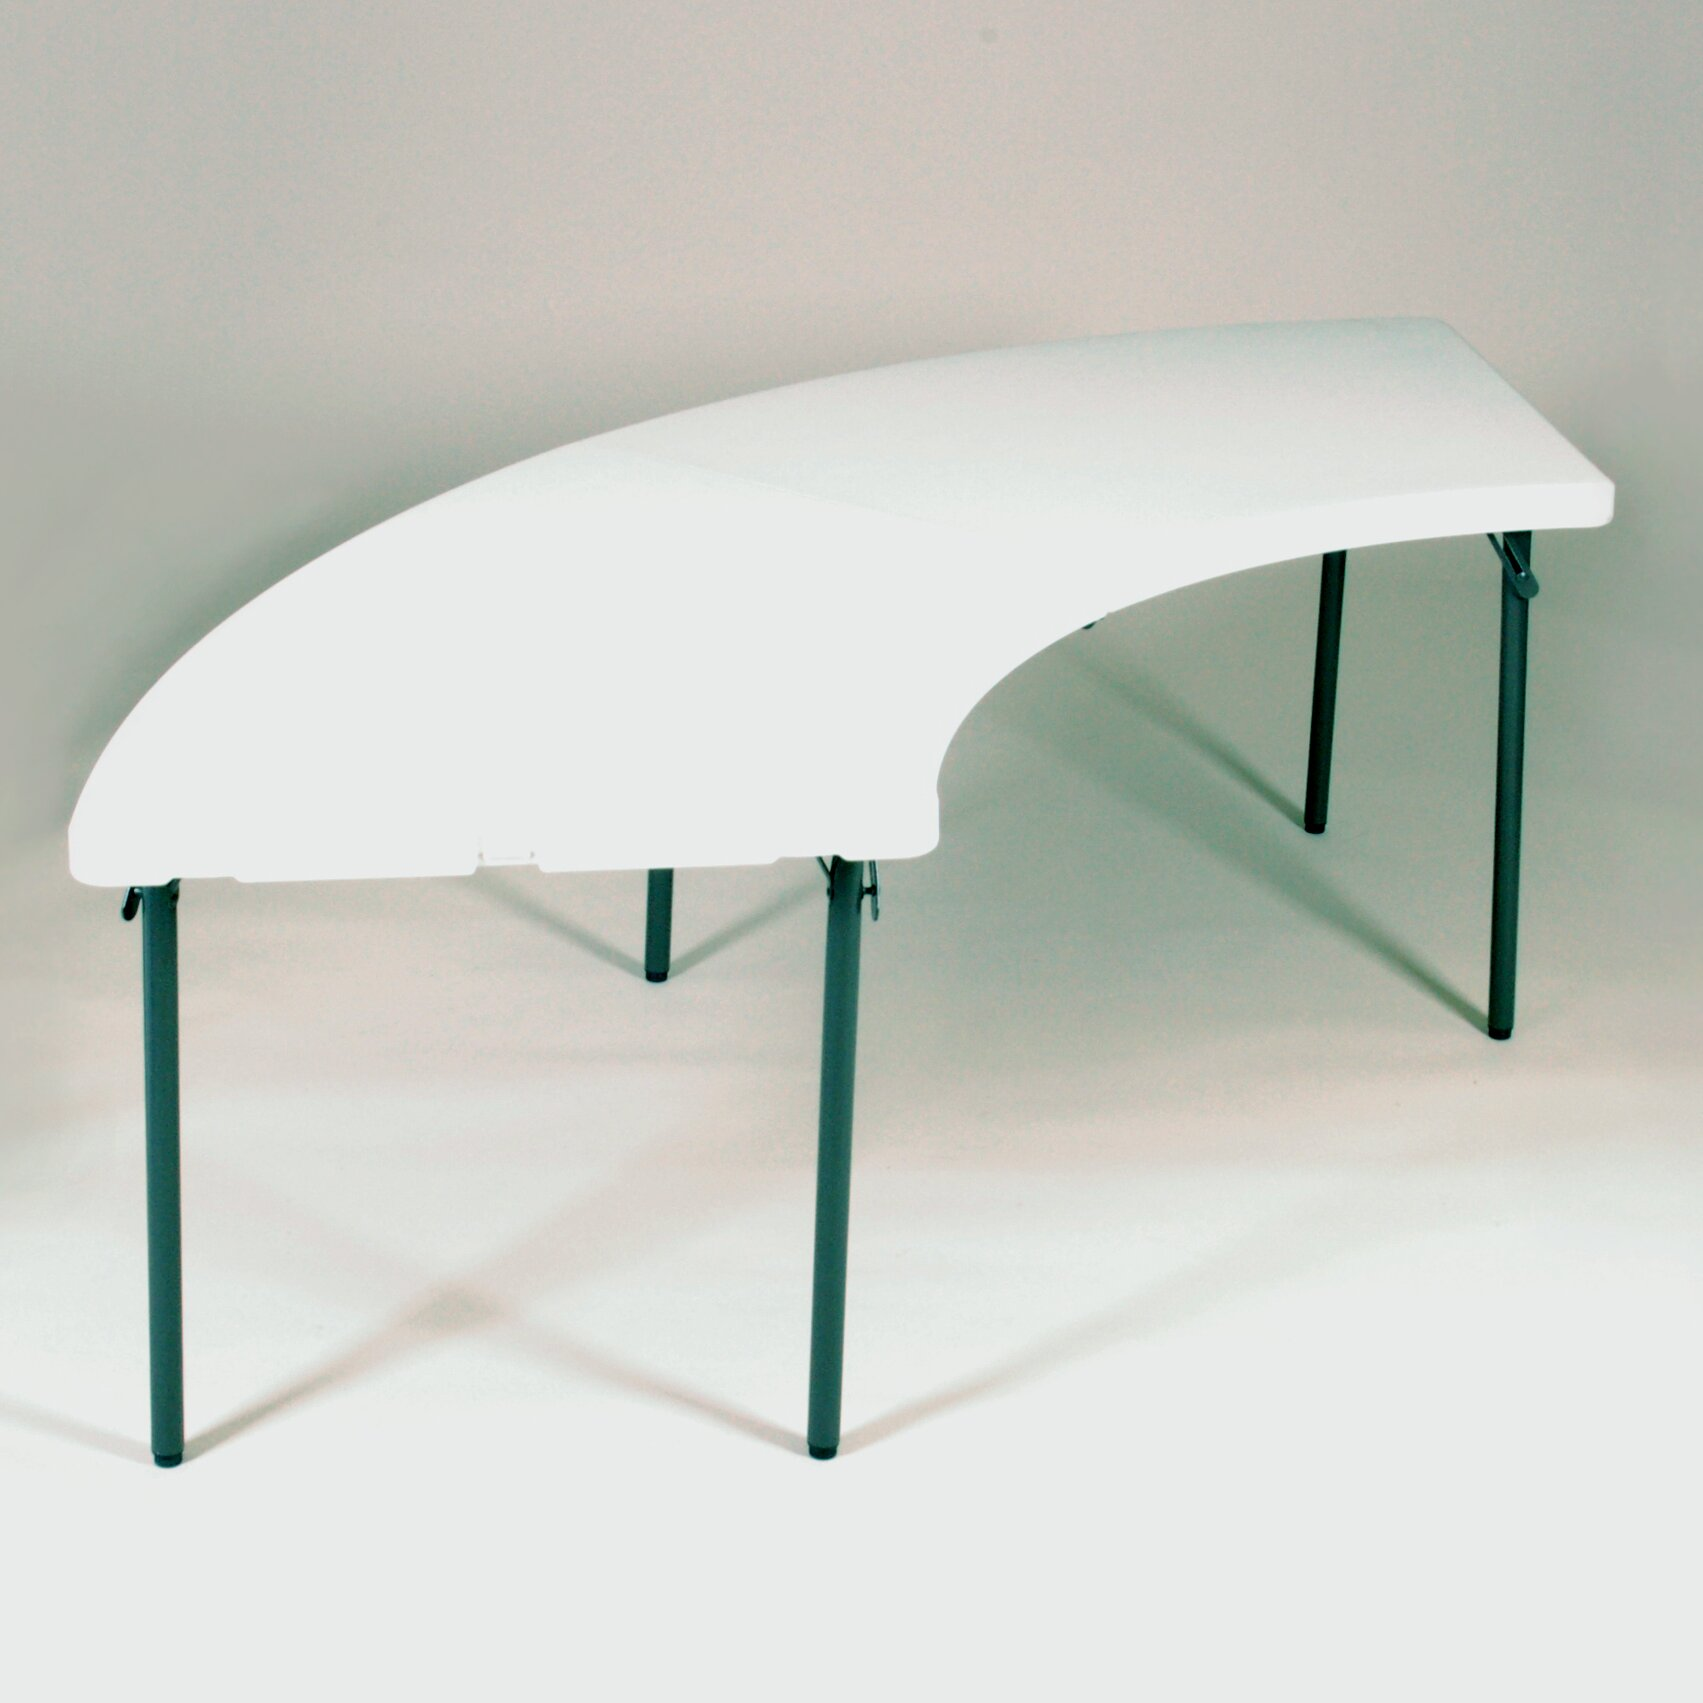 "Office Max Furniture Desks Correll, Inc. 96"" Semi Circle Folding Table & Reviews | Wayfair Supply"